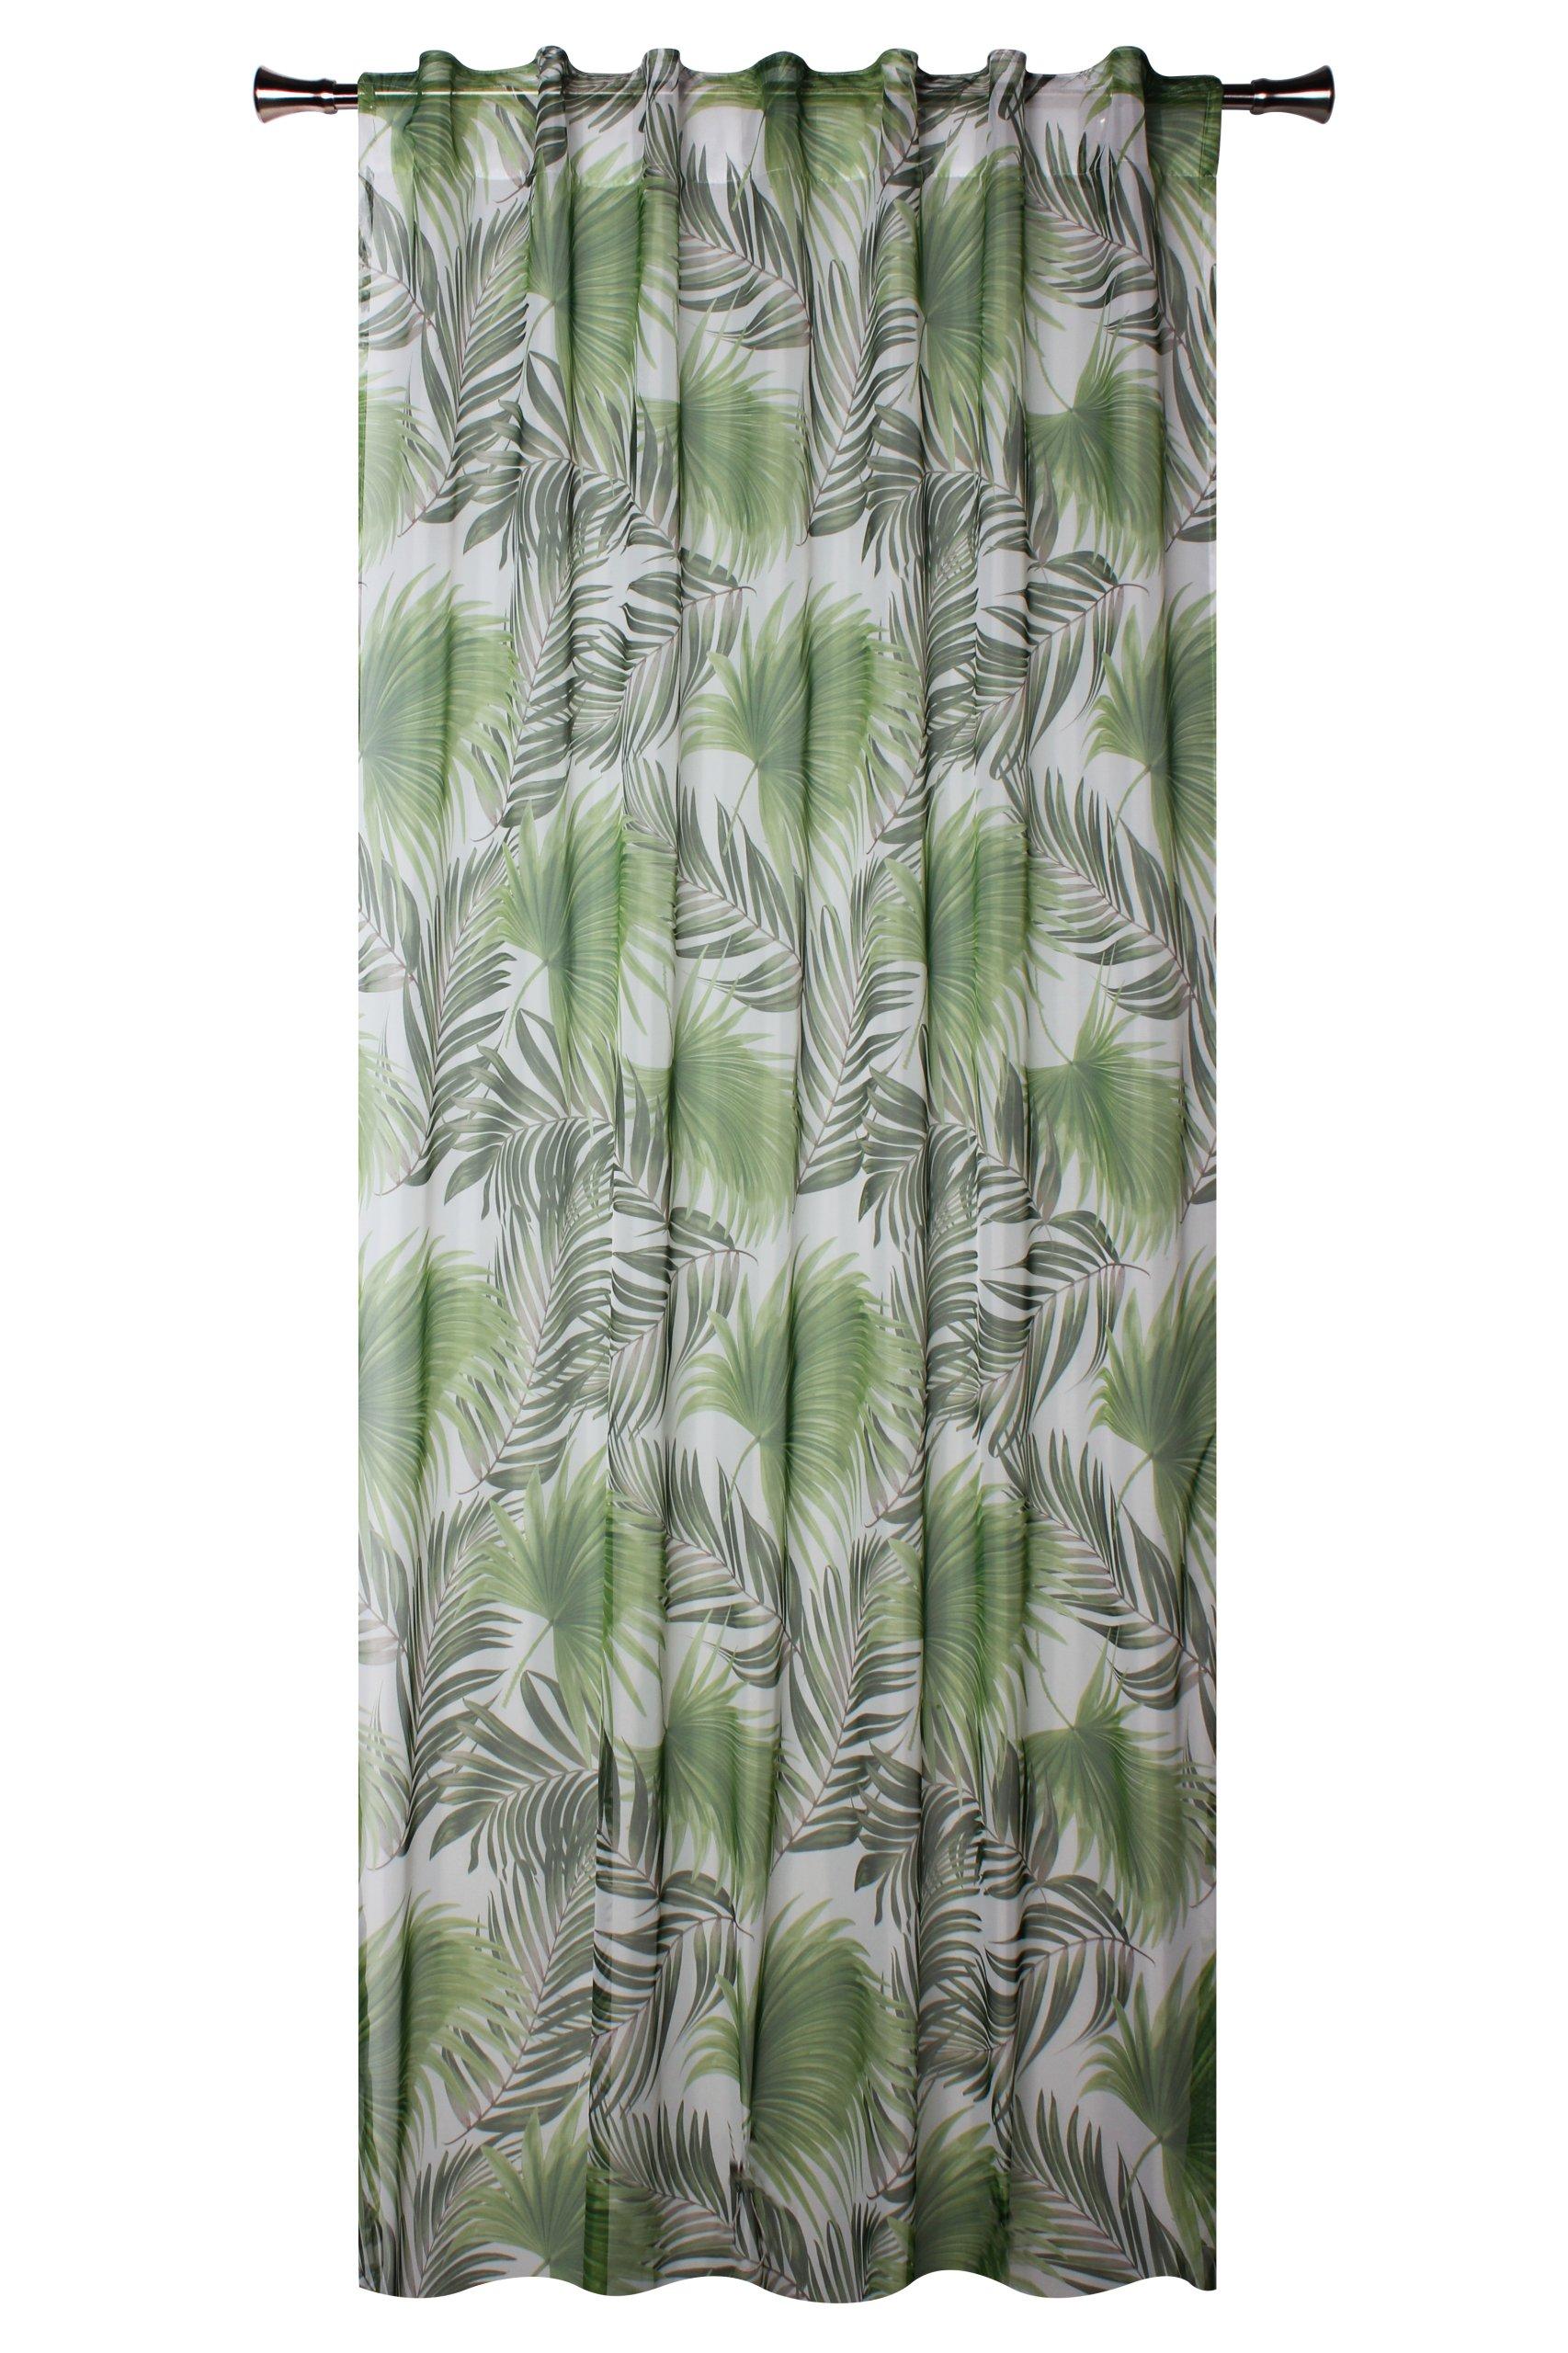 Firana Palmas Druk Liście Jungle Woal 140x245 Cm